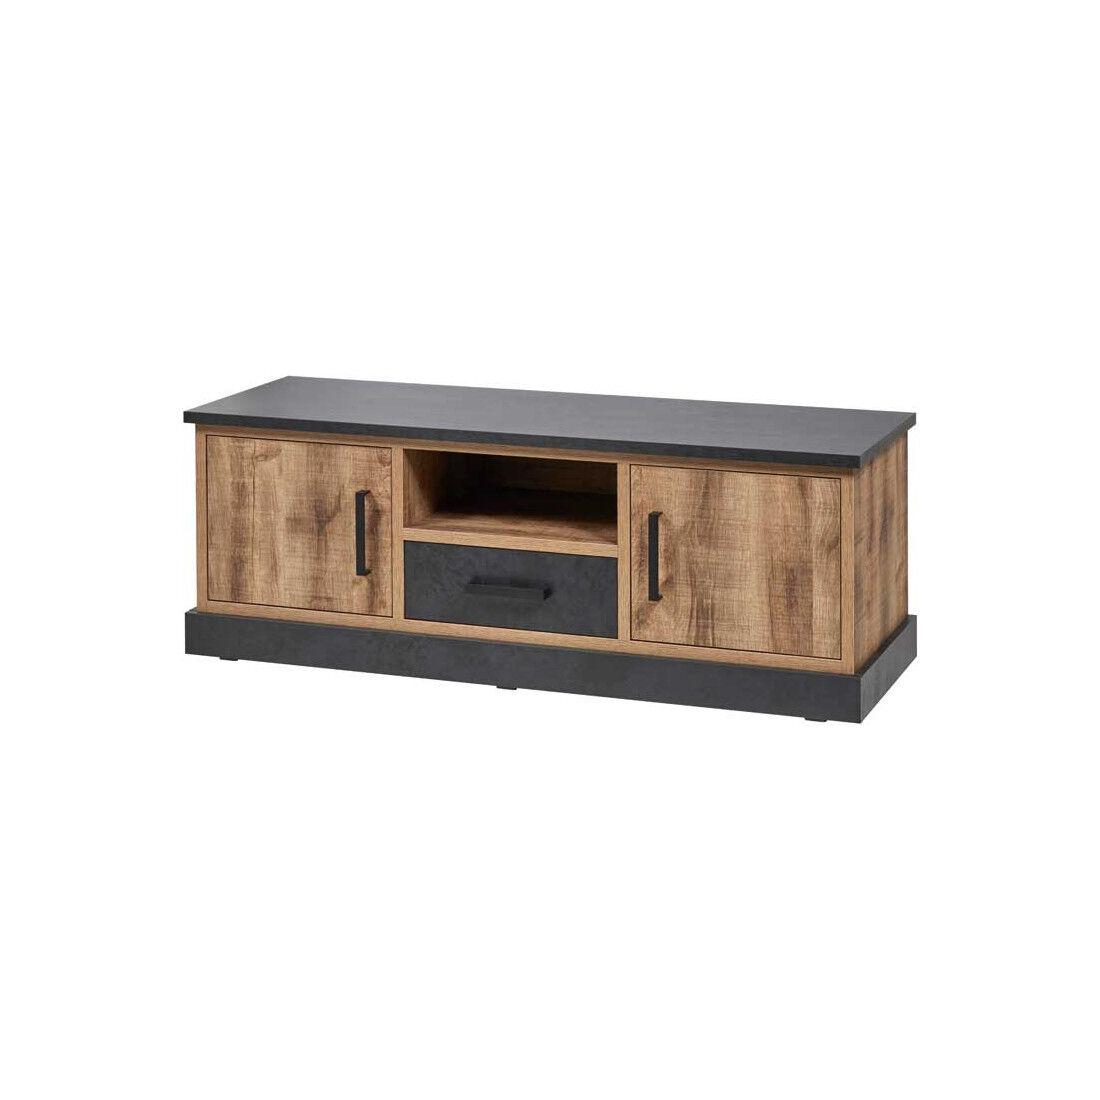 Tousmesmeubles Meuble TV 2 portes 1 tiroir Bois Tropical - TESSA - L 142 x l 48 x H 51